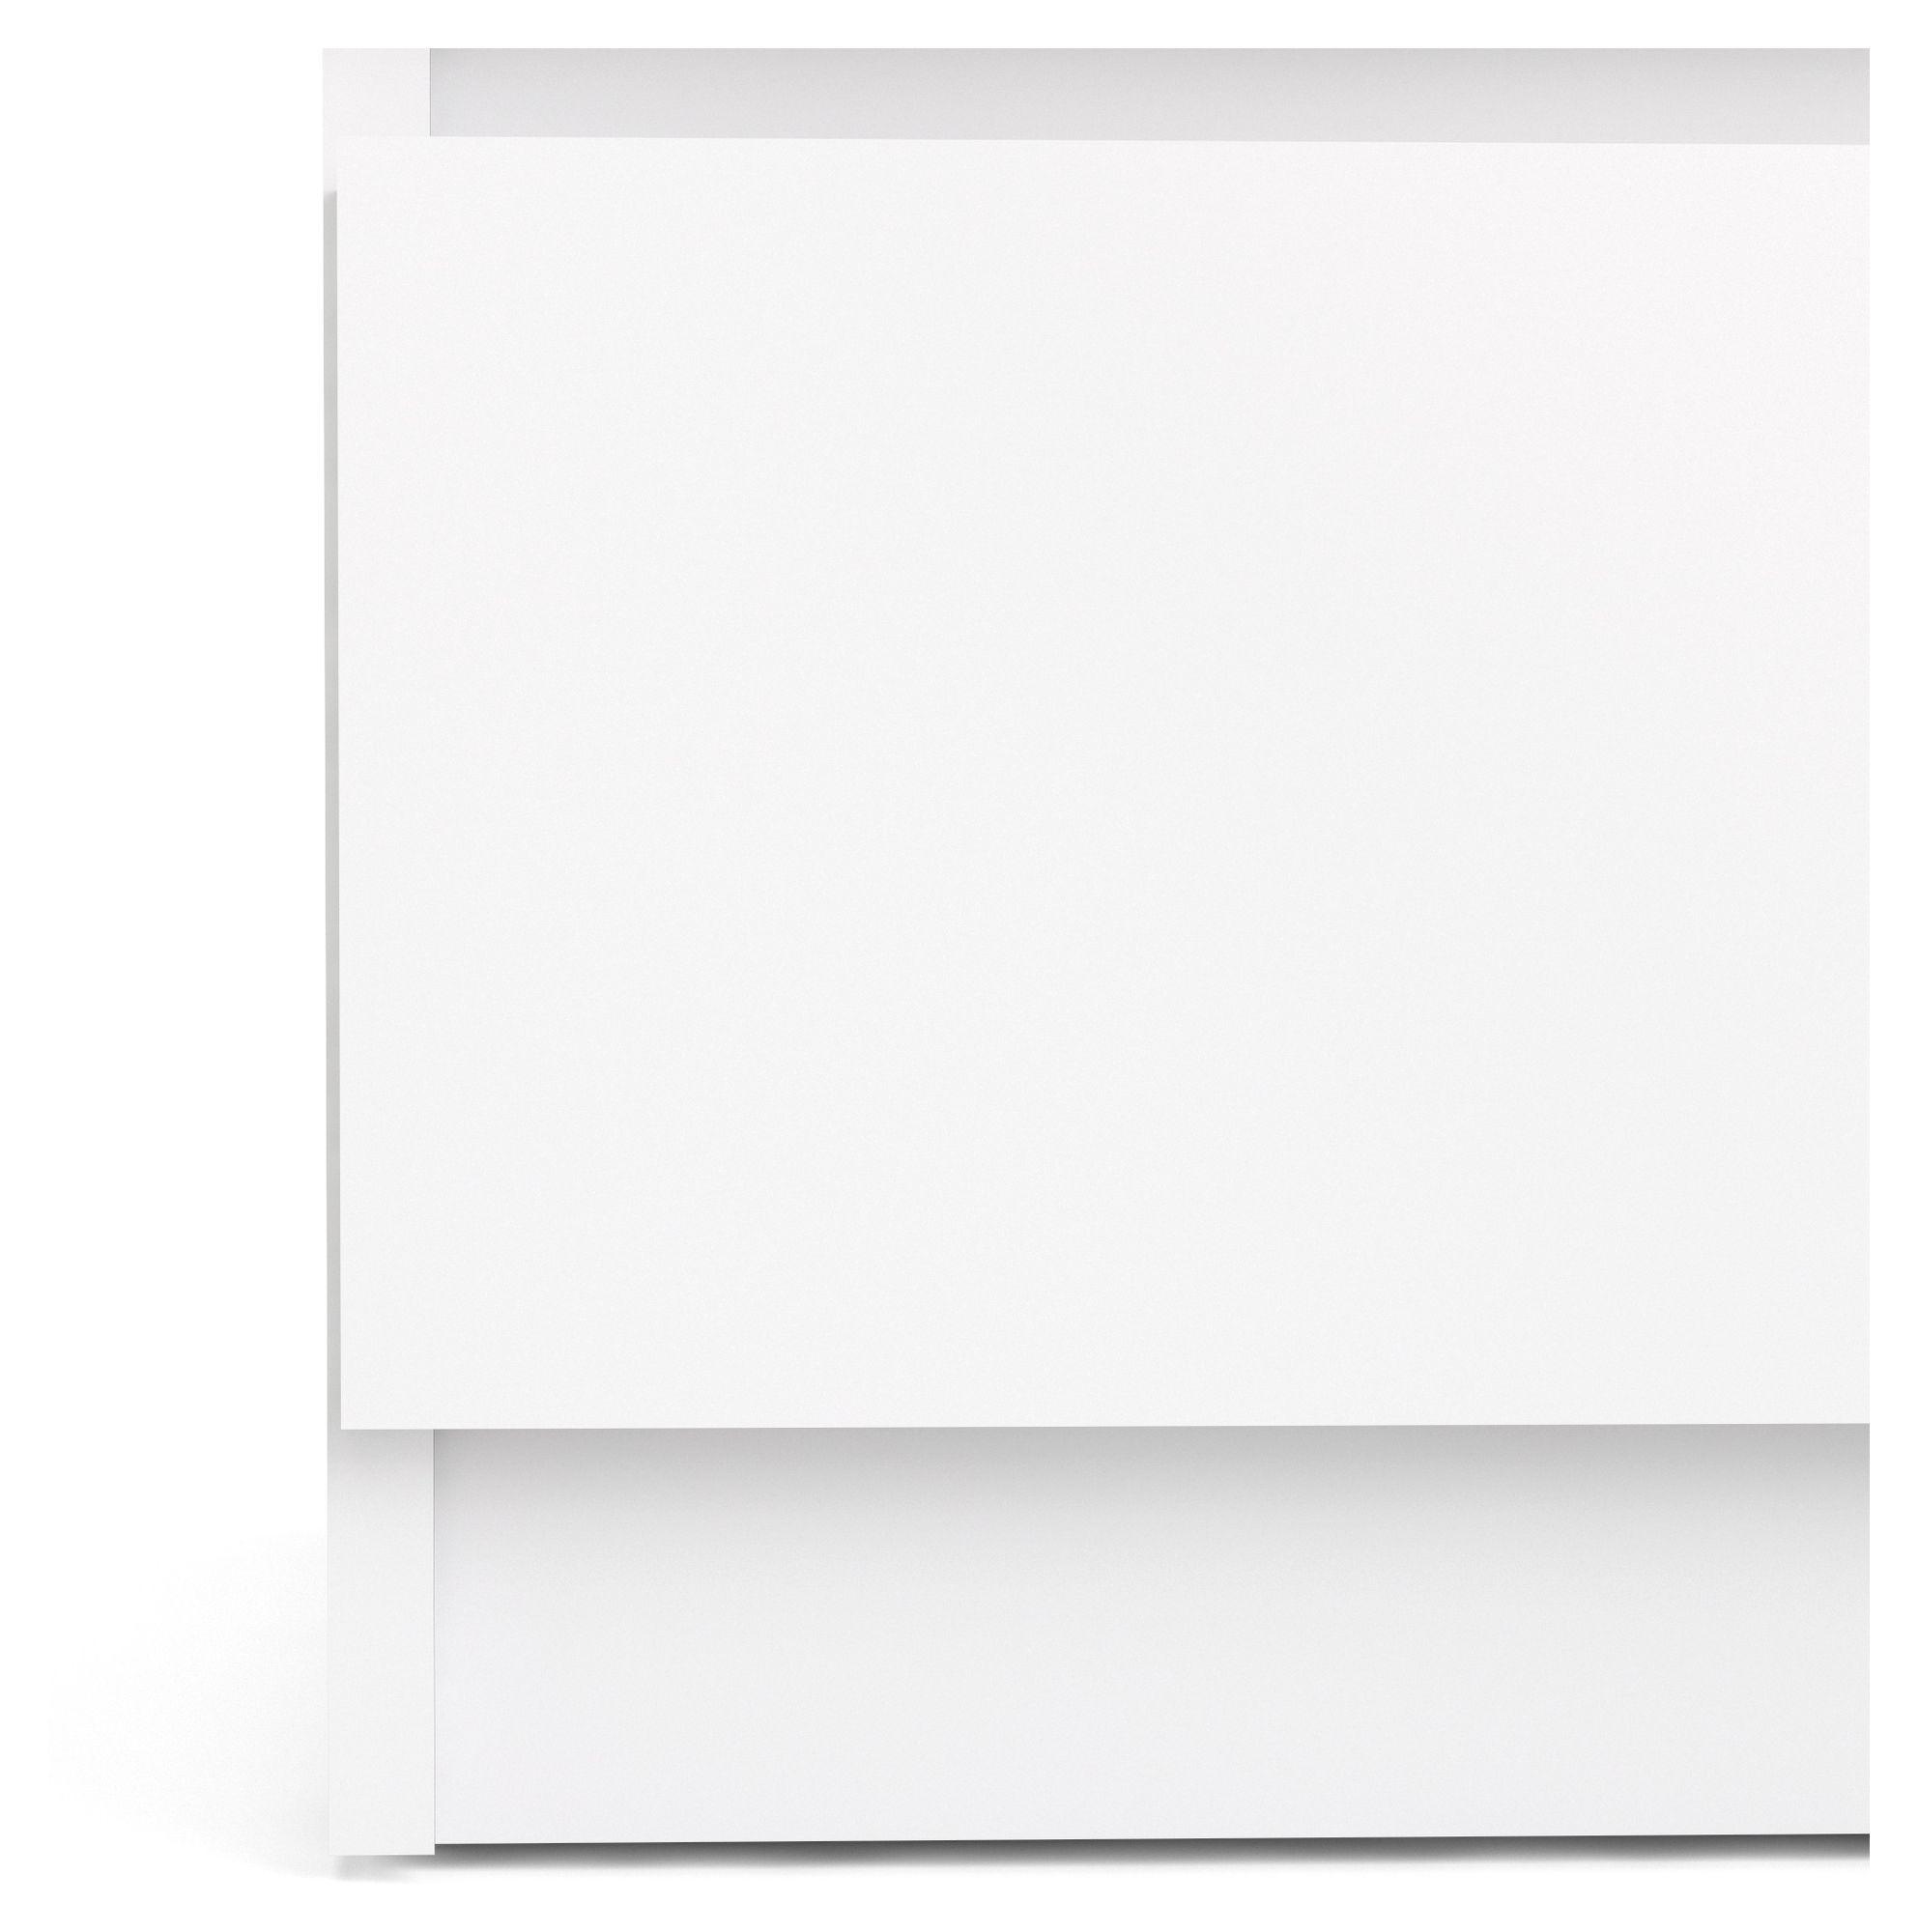 Naia Sengebord - Hvid højglans - Sengebord i hvid højglans